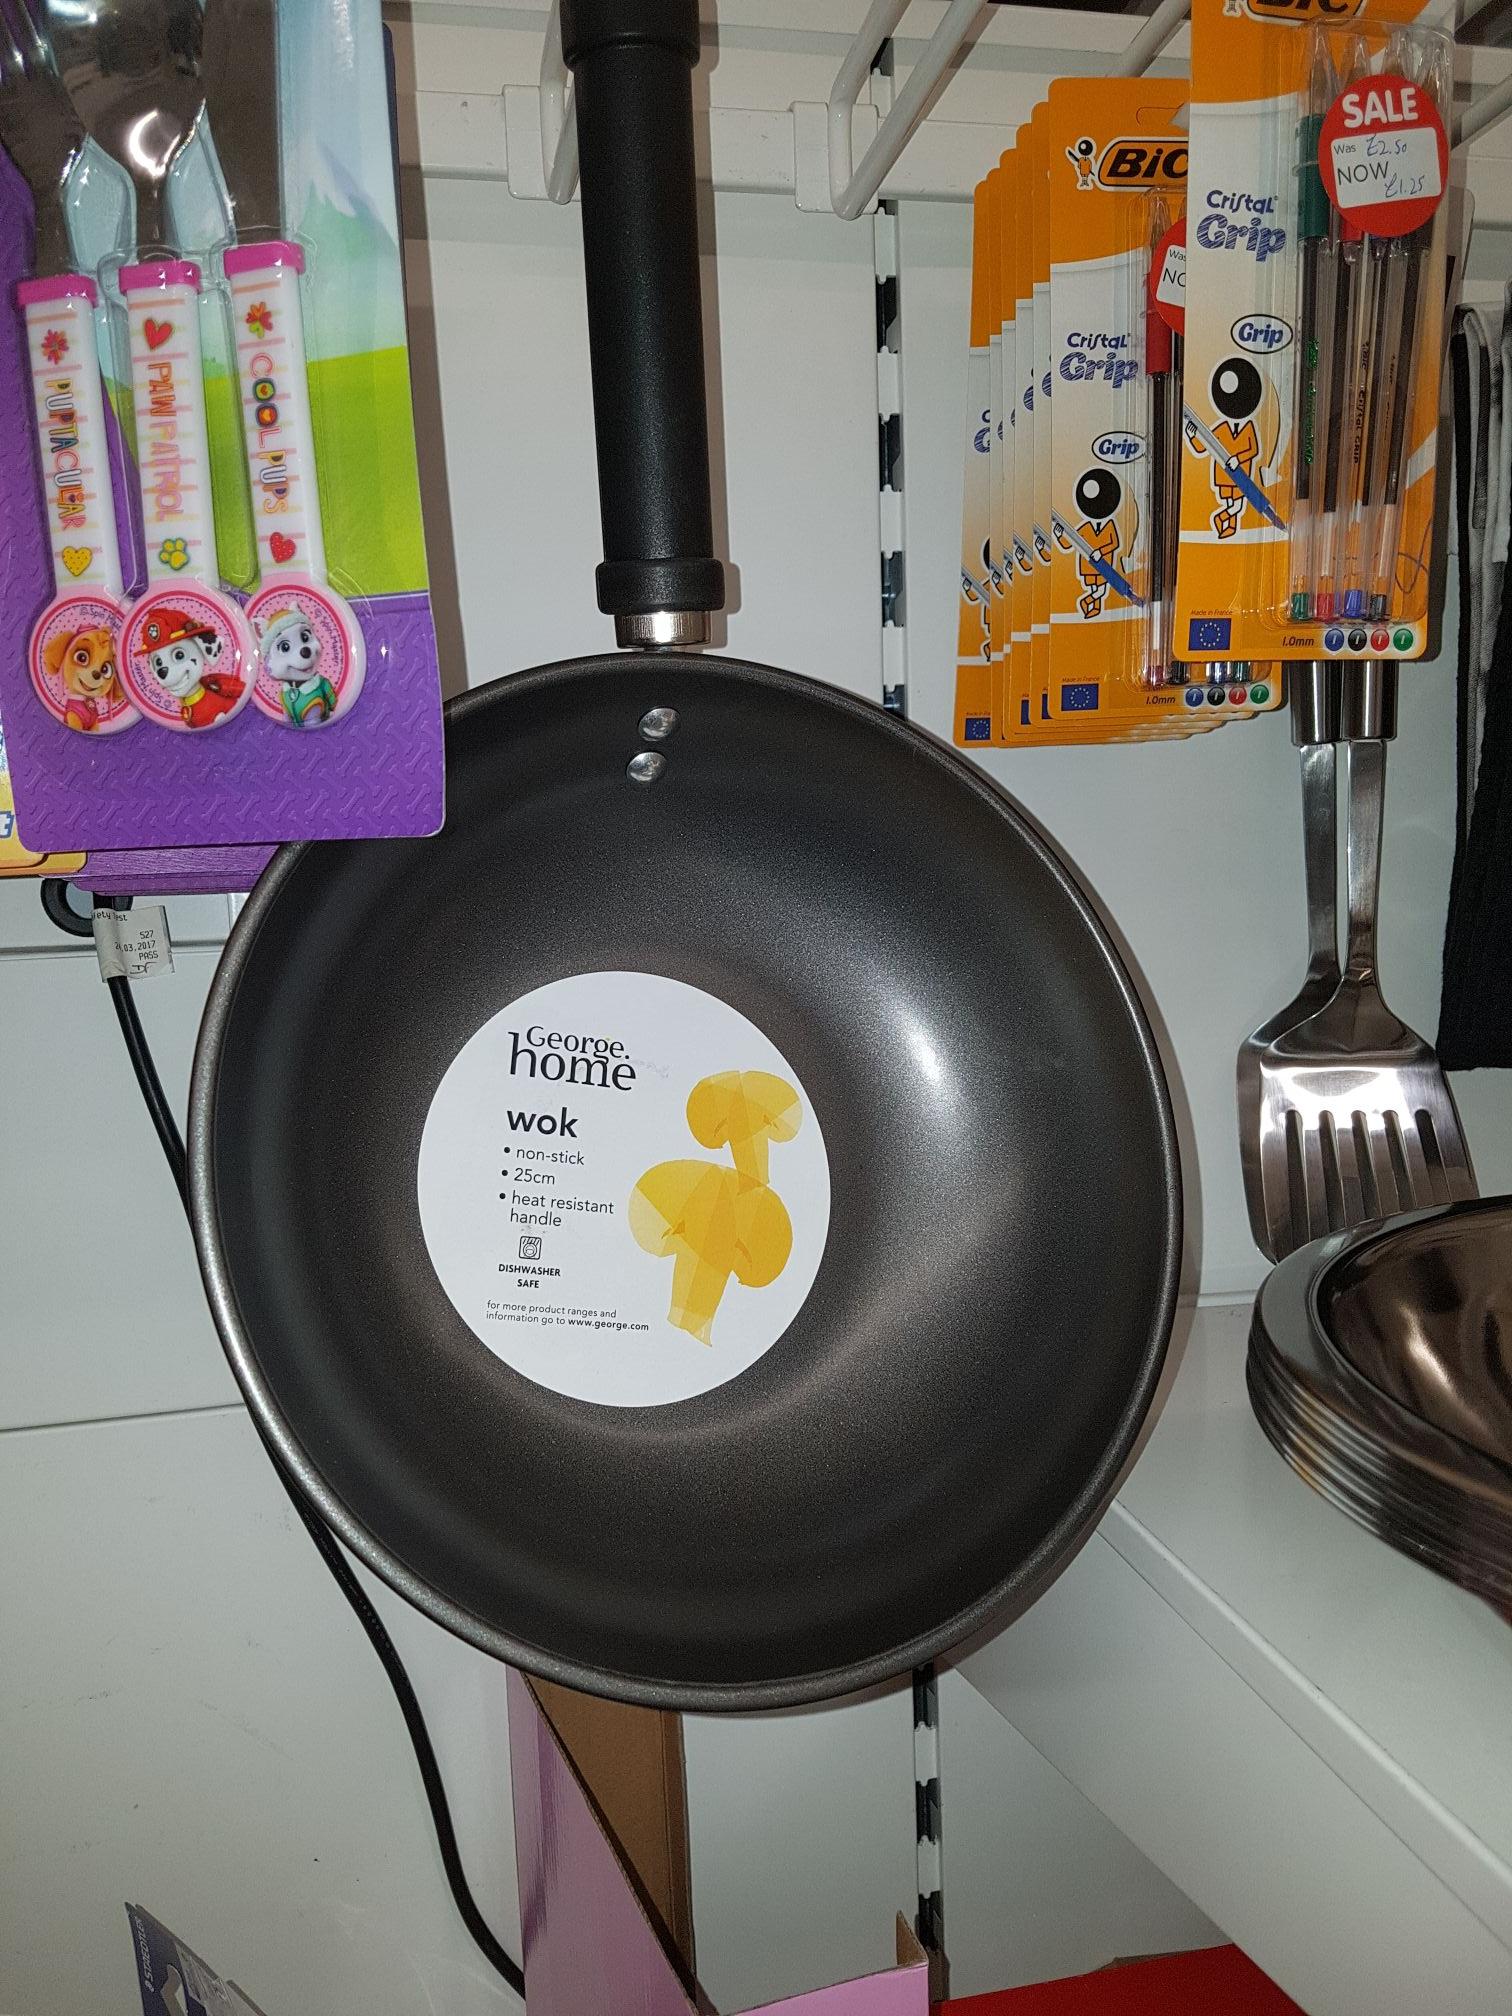 George HOME wok £1.50 at Asda instore